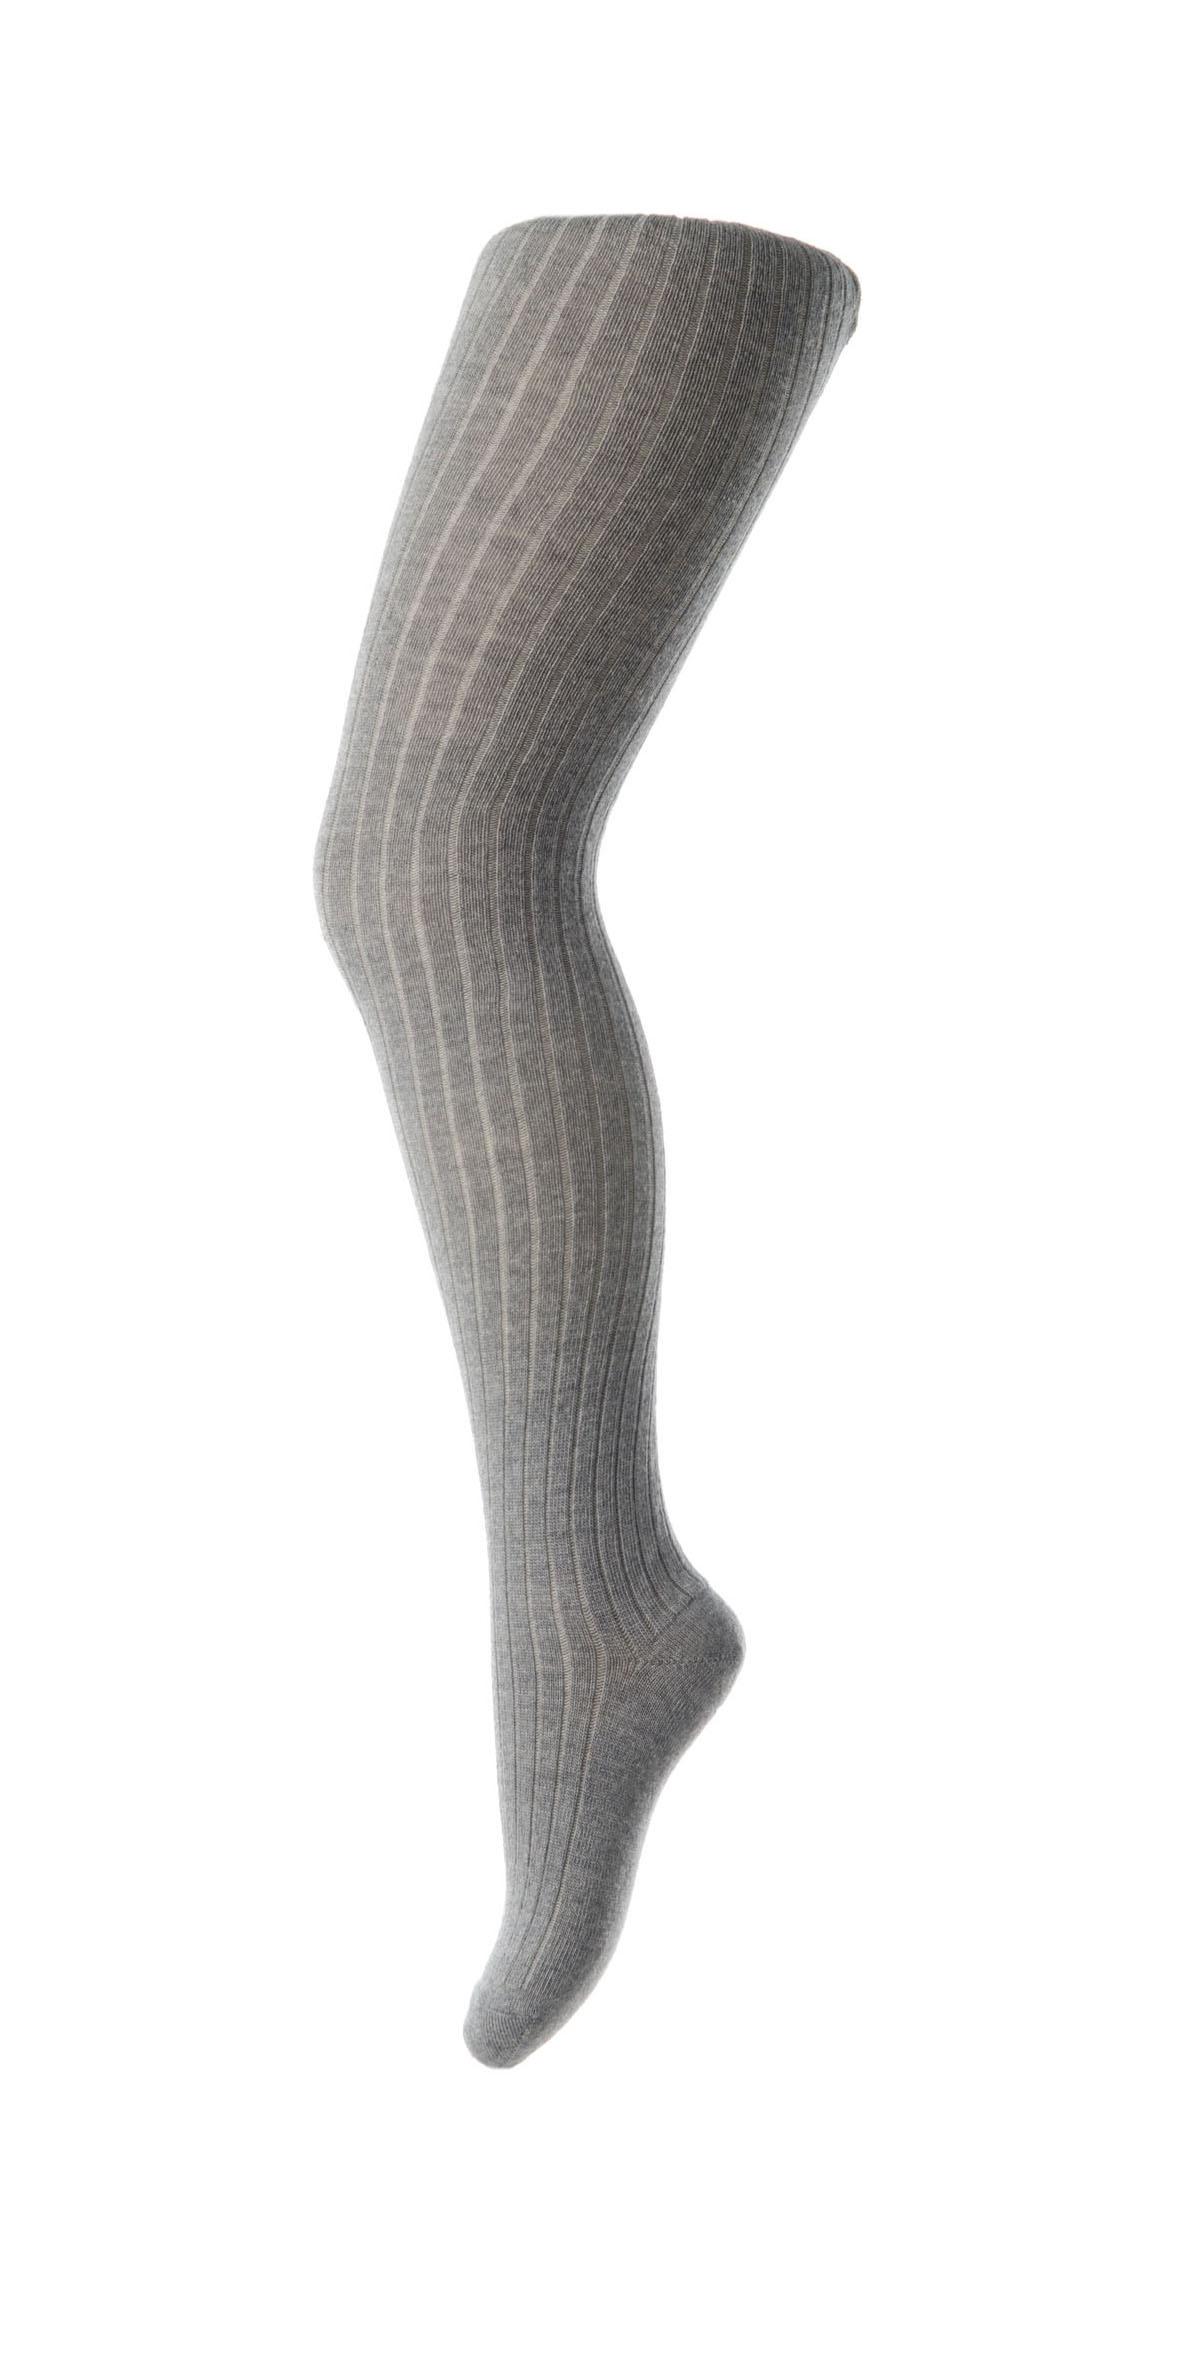 MP Uld strømpebuks, grey marled, 110